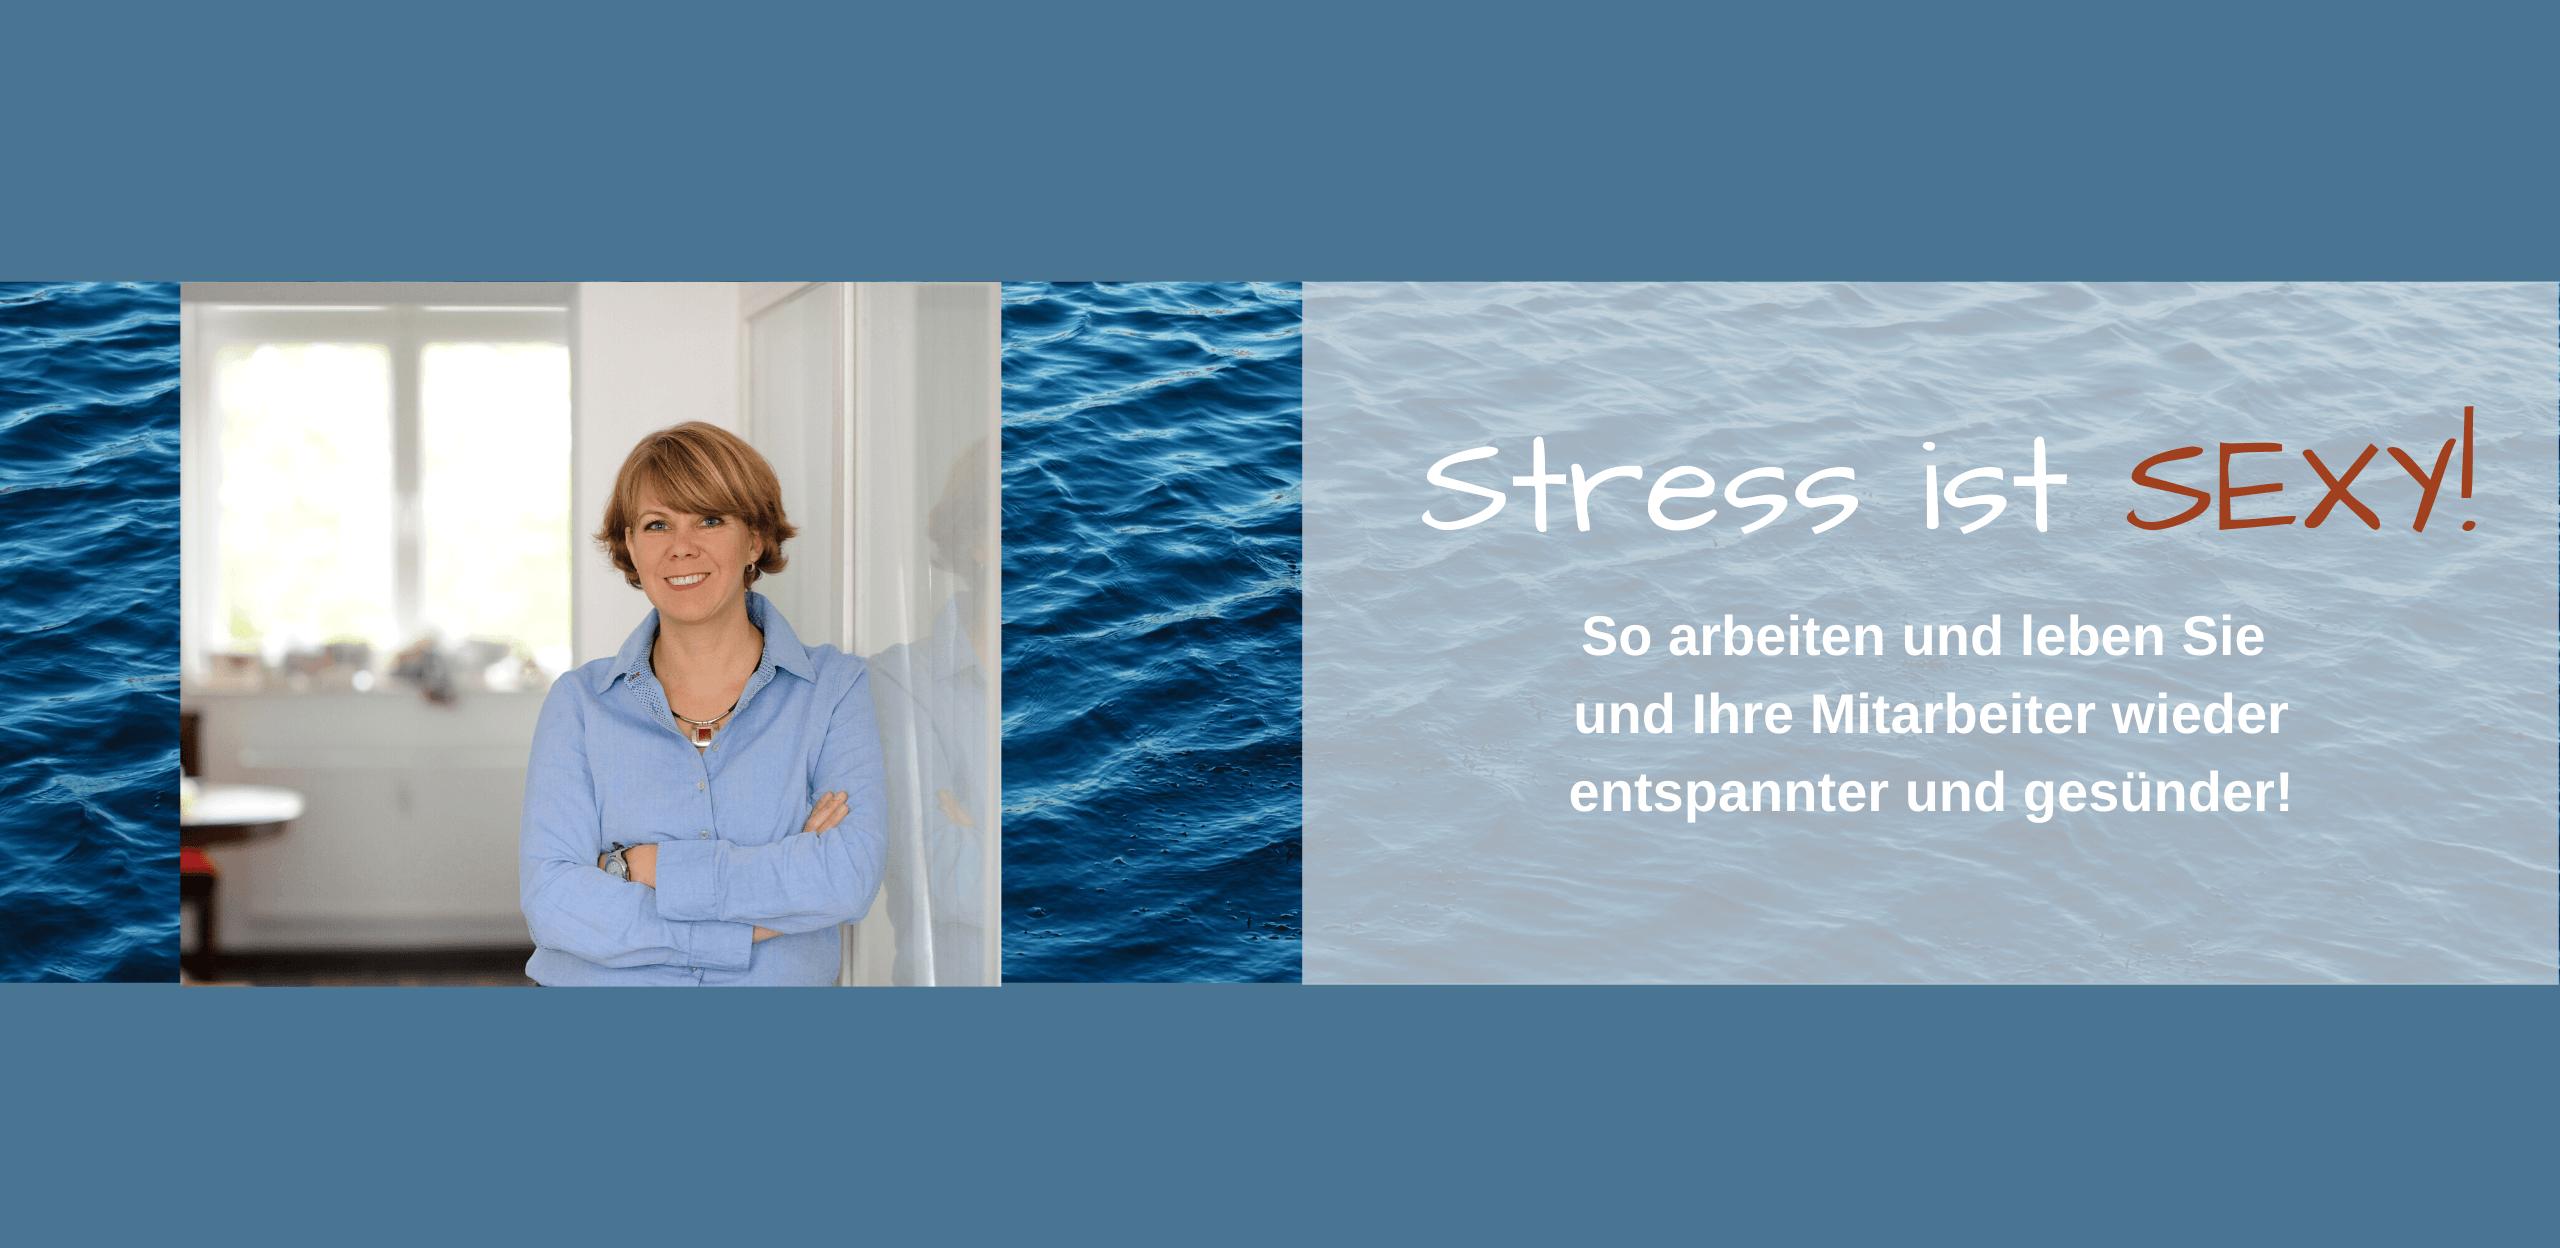 Stress ist sexy Christina Thiel